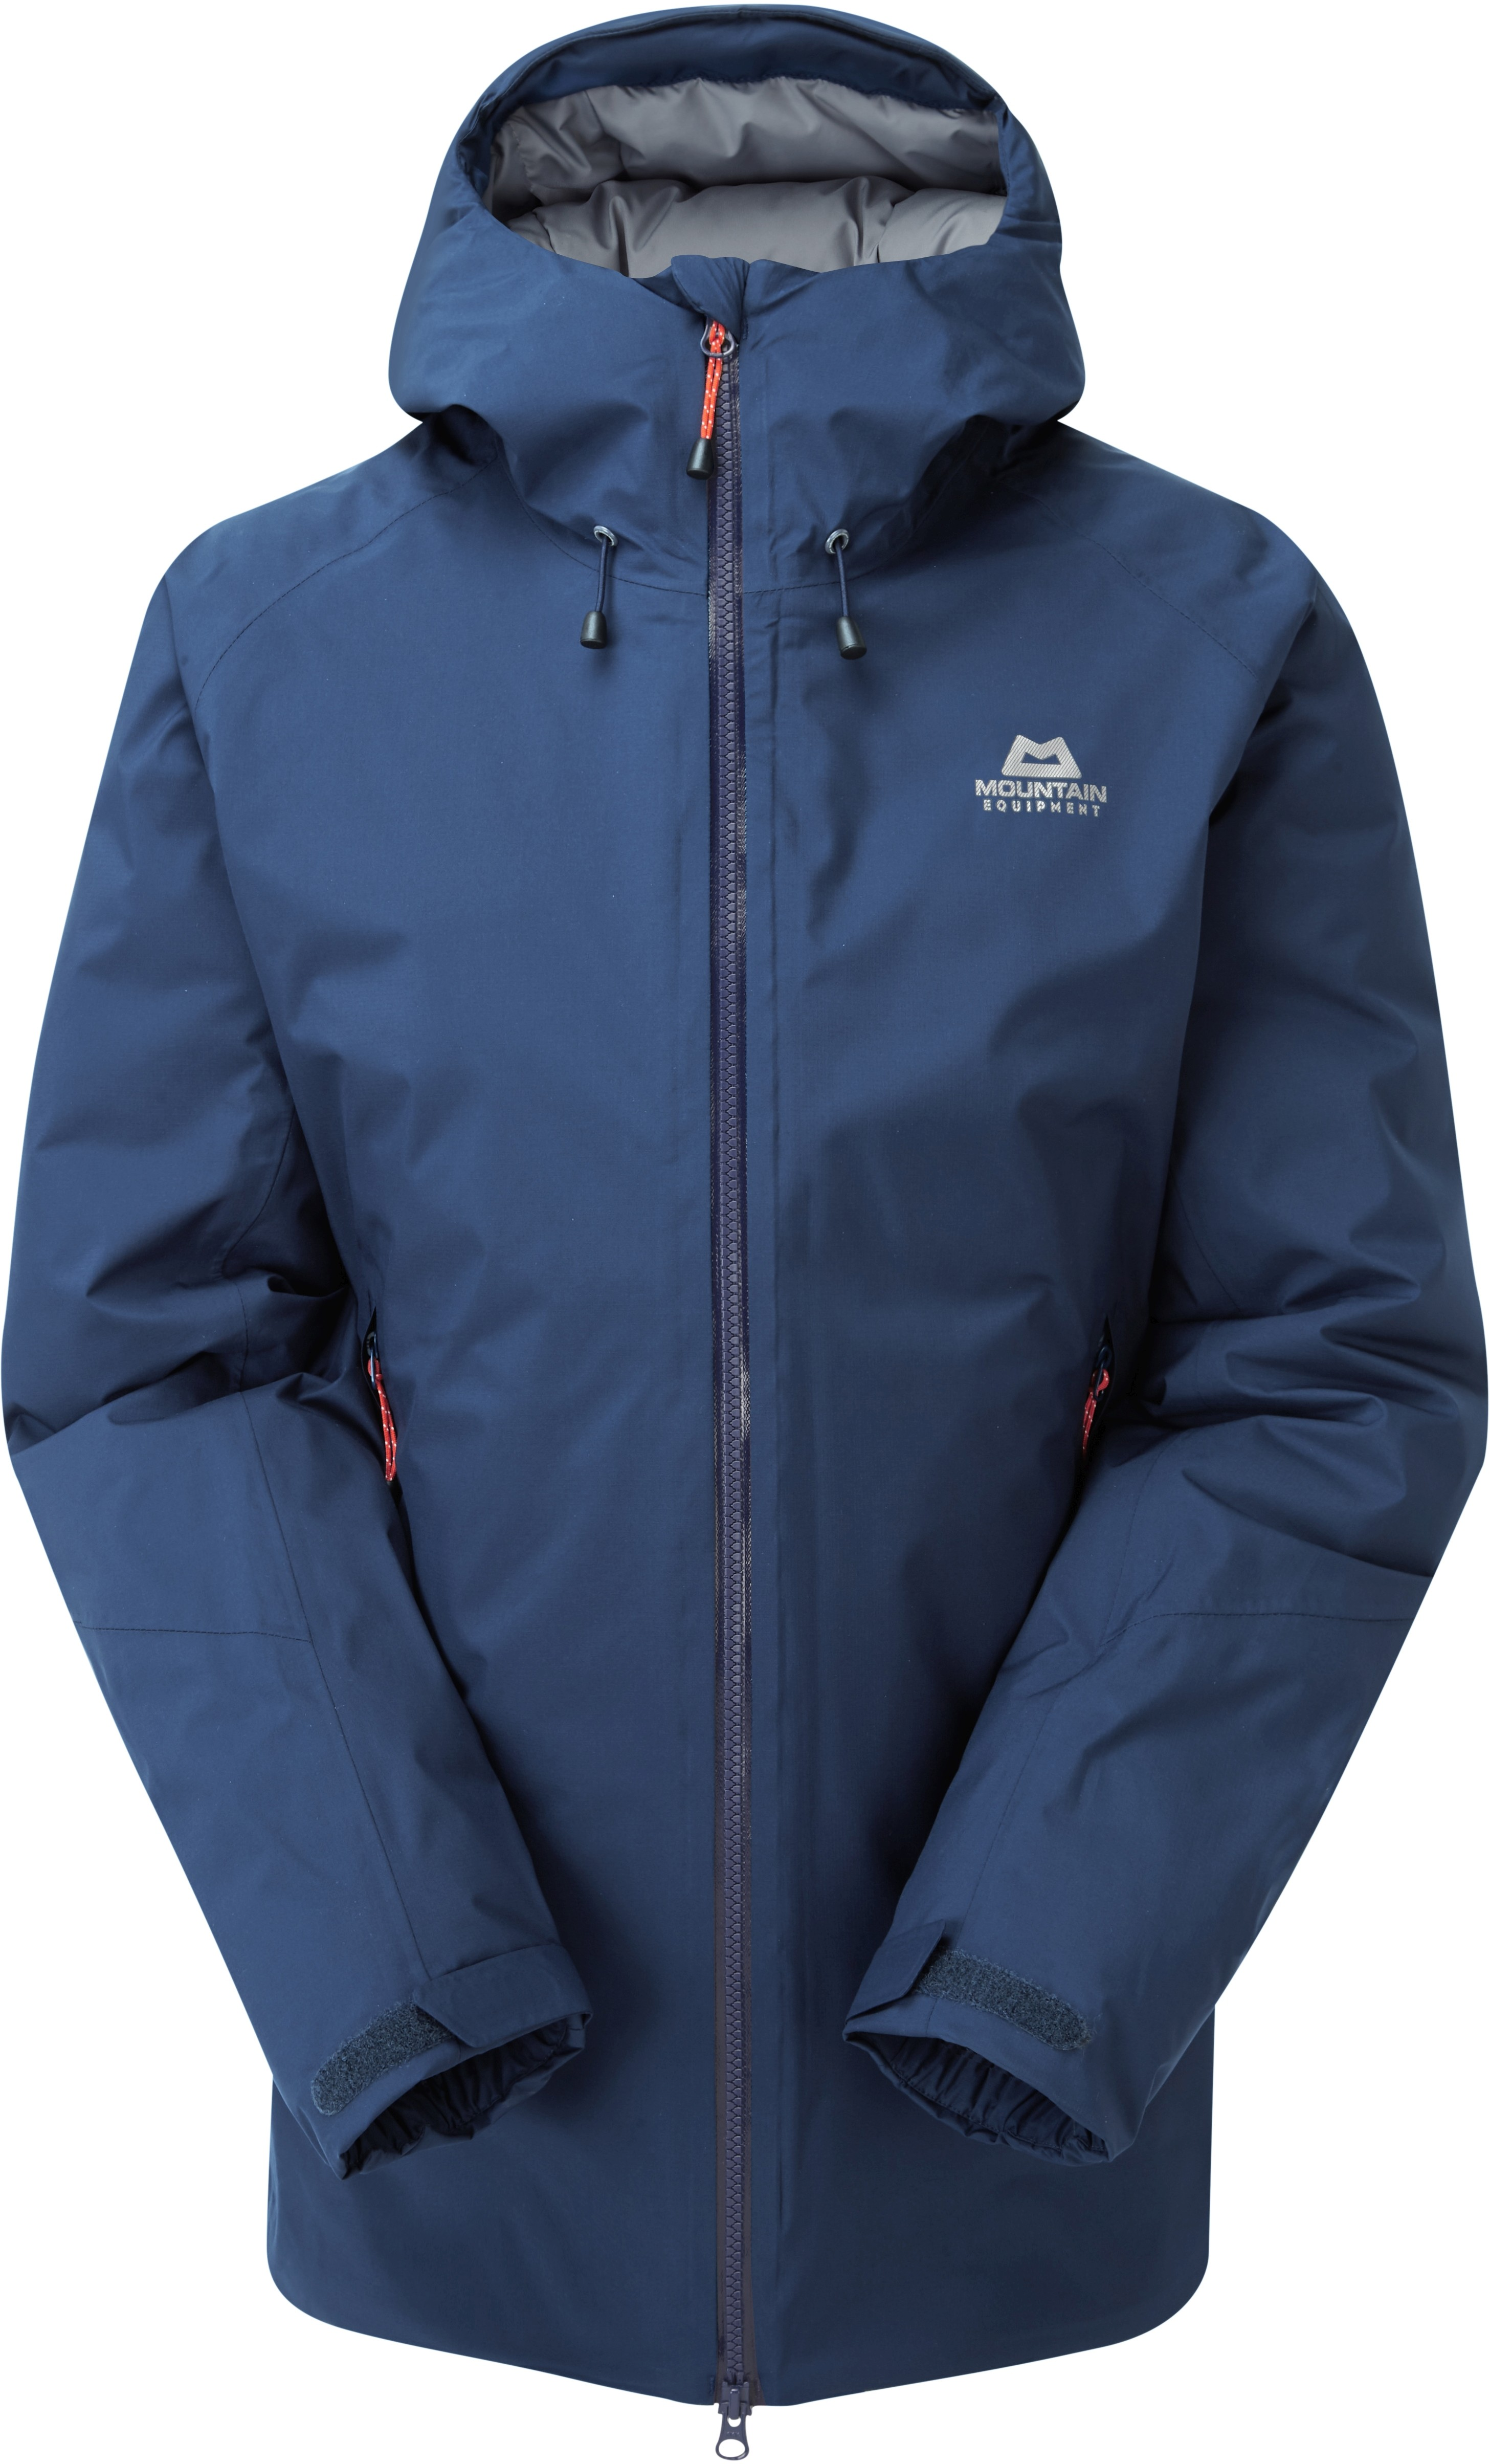 Mountain Versandkosten Equipment Jacket WomensOhne Triton wOm8nvN0y